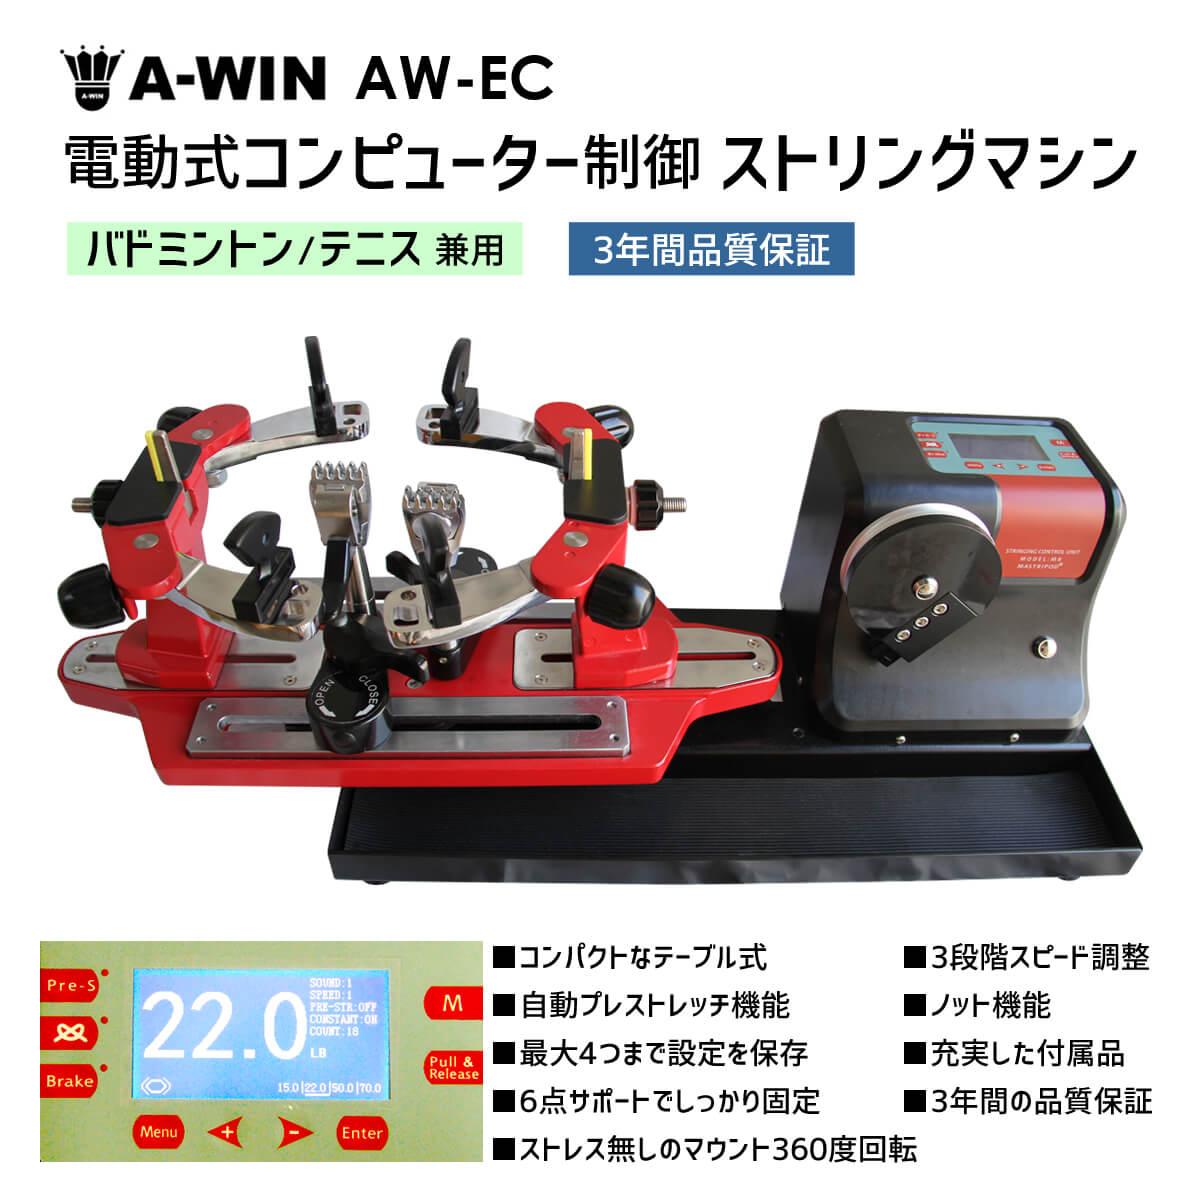 A-WIN AW-EC ストリングマシン 電動式コンピューター制御 バドミントン・テニス兼用 テーブル式ガット張り機 アーウィン【3年間品質保証付/送料無料/代引き不可】